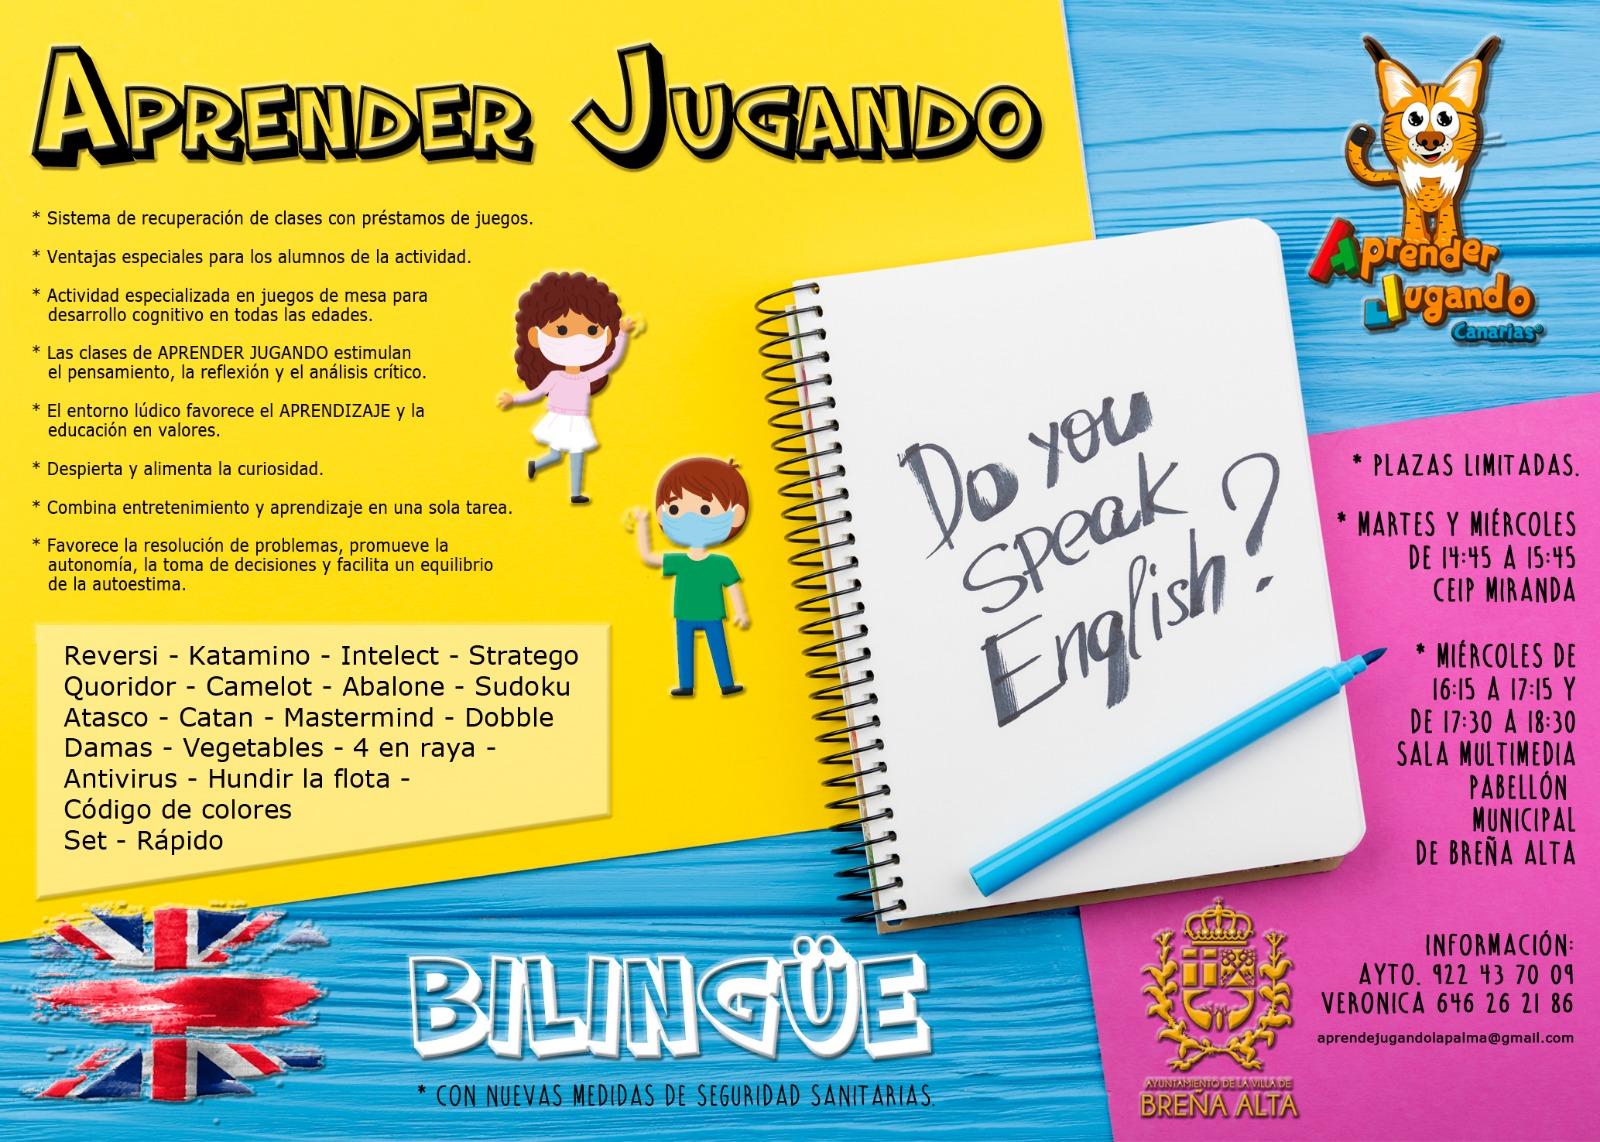 Aprender Jugando Bilingüe Breña Alta